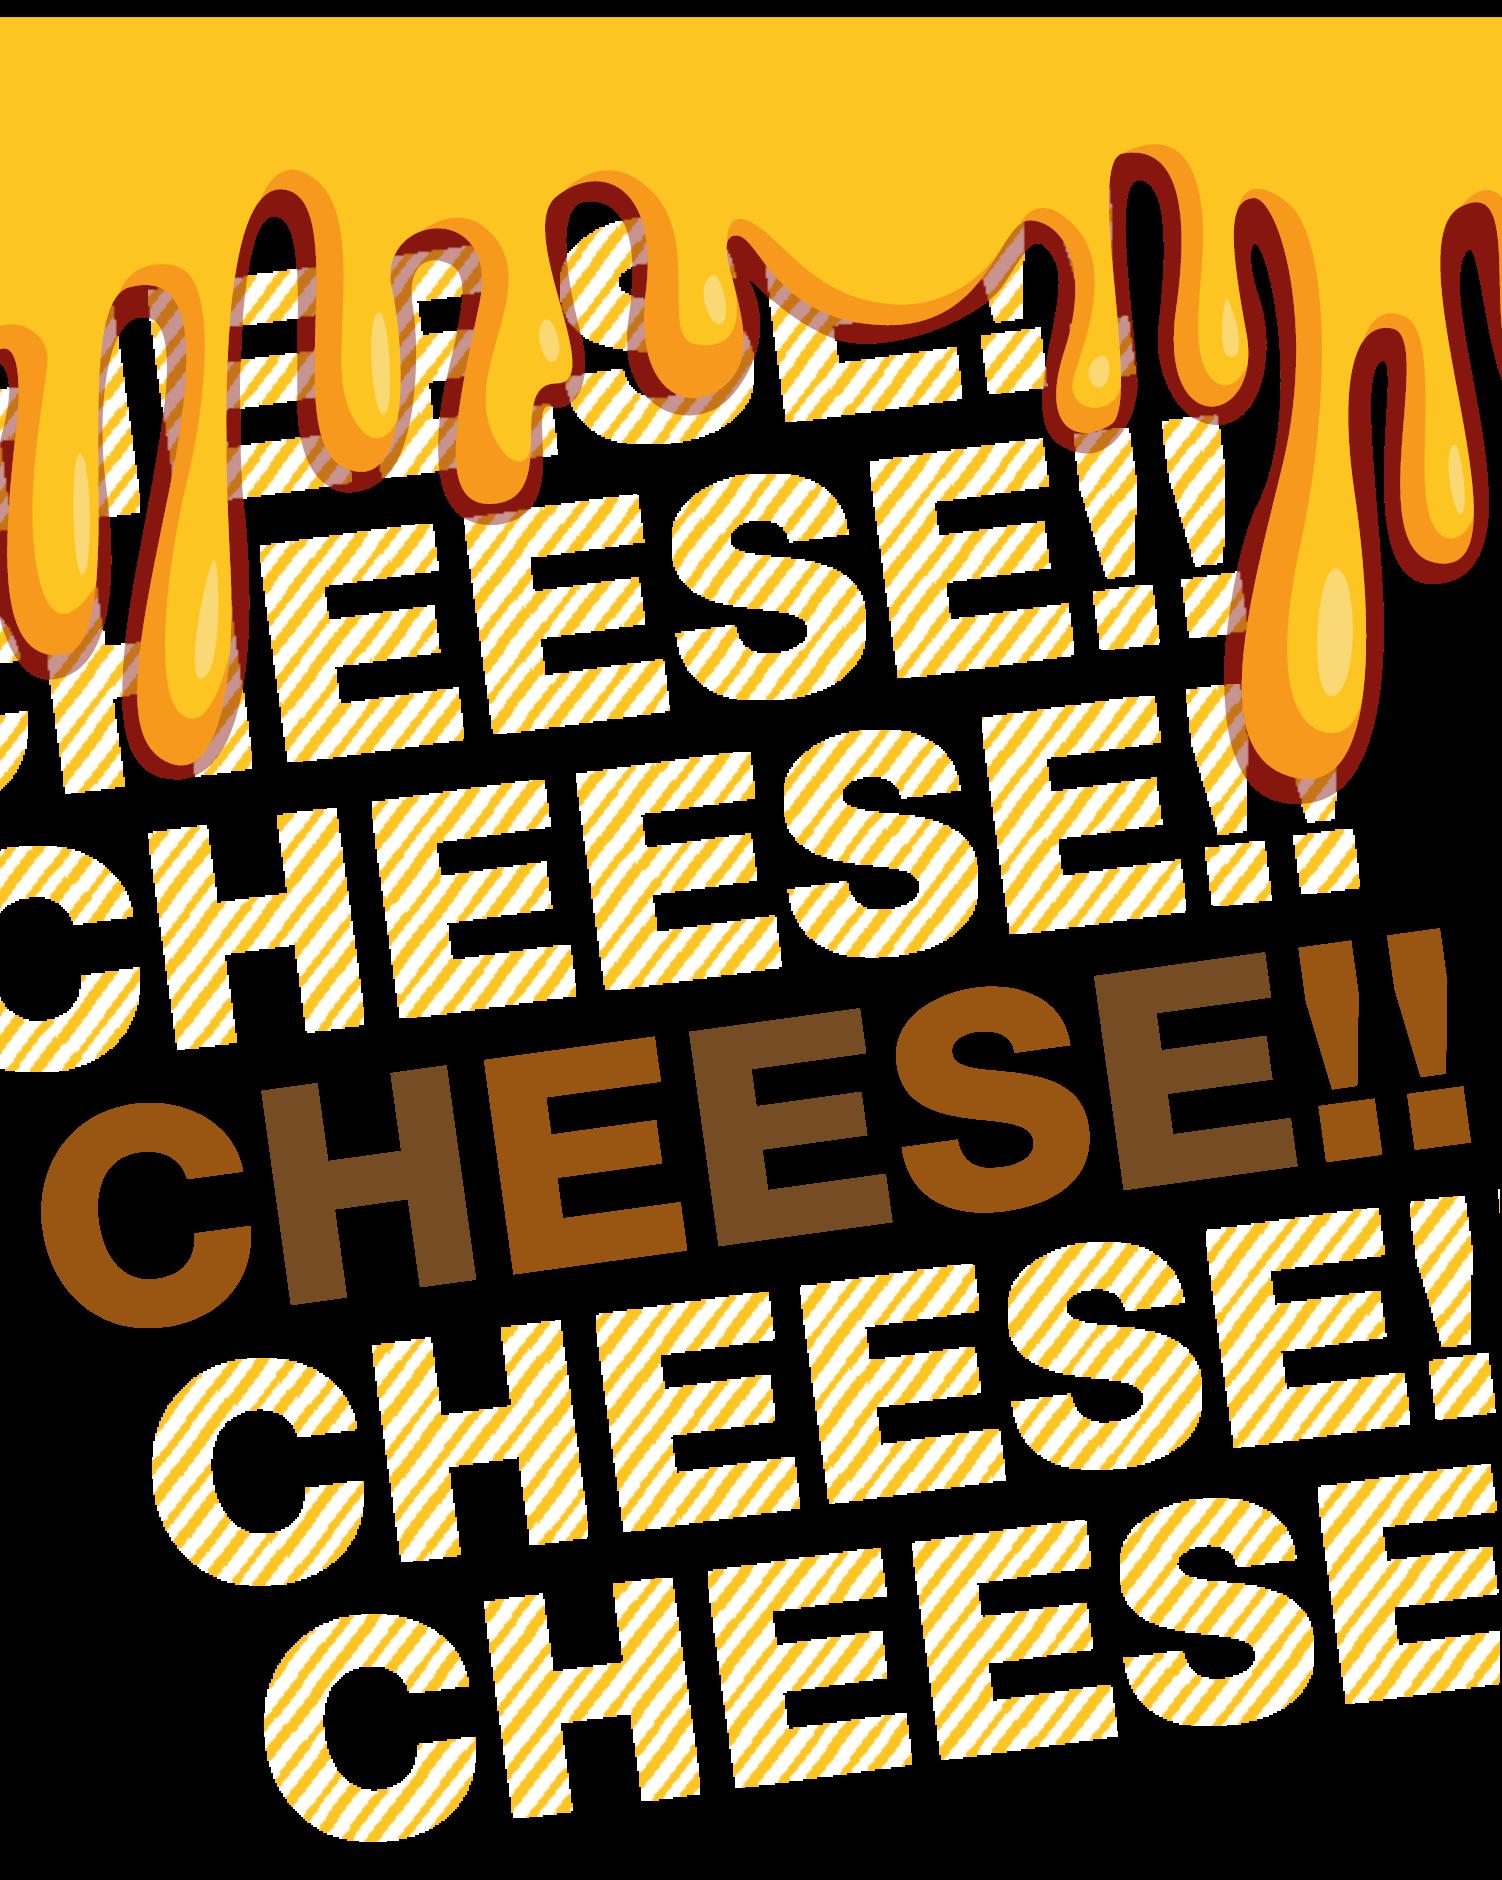 CHEESE! CHEESE! CHEESE! CHEESE! CHEESE!